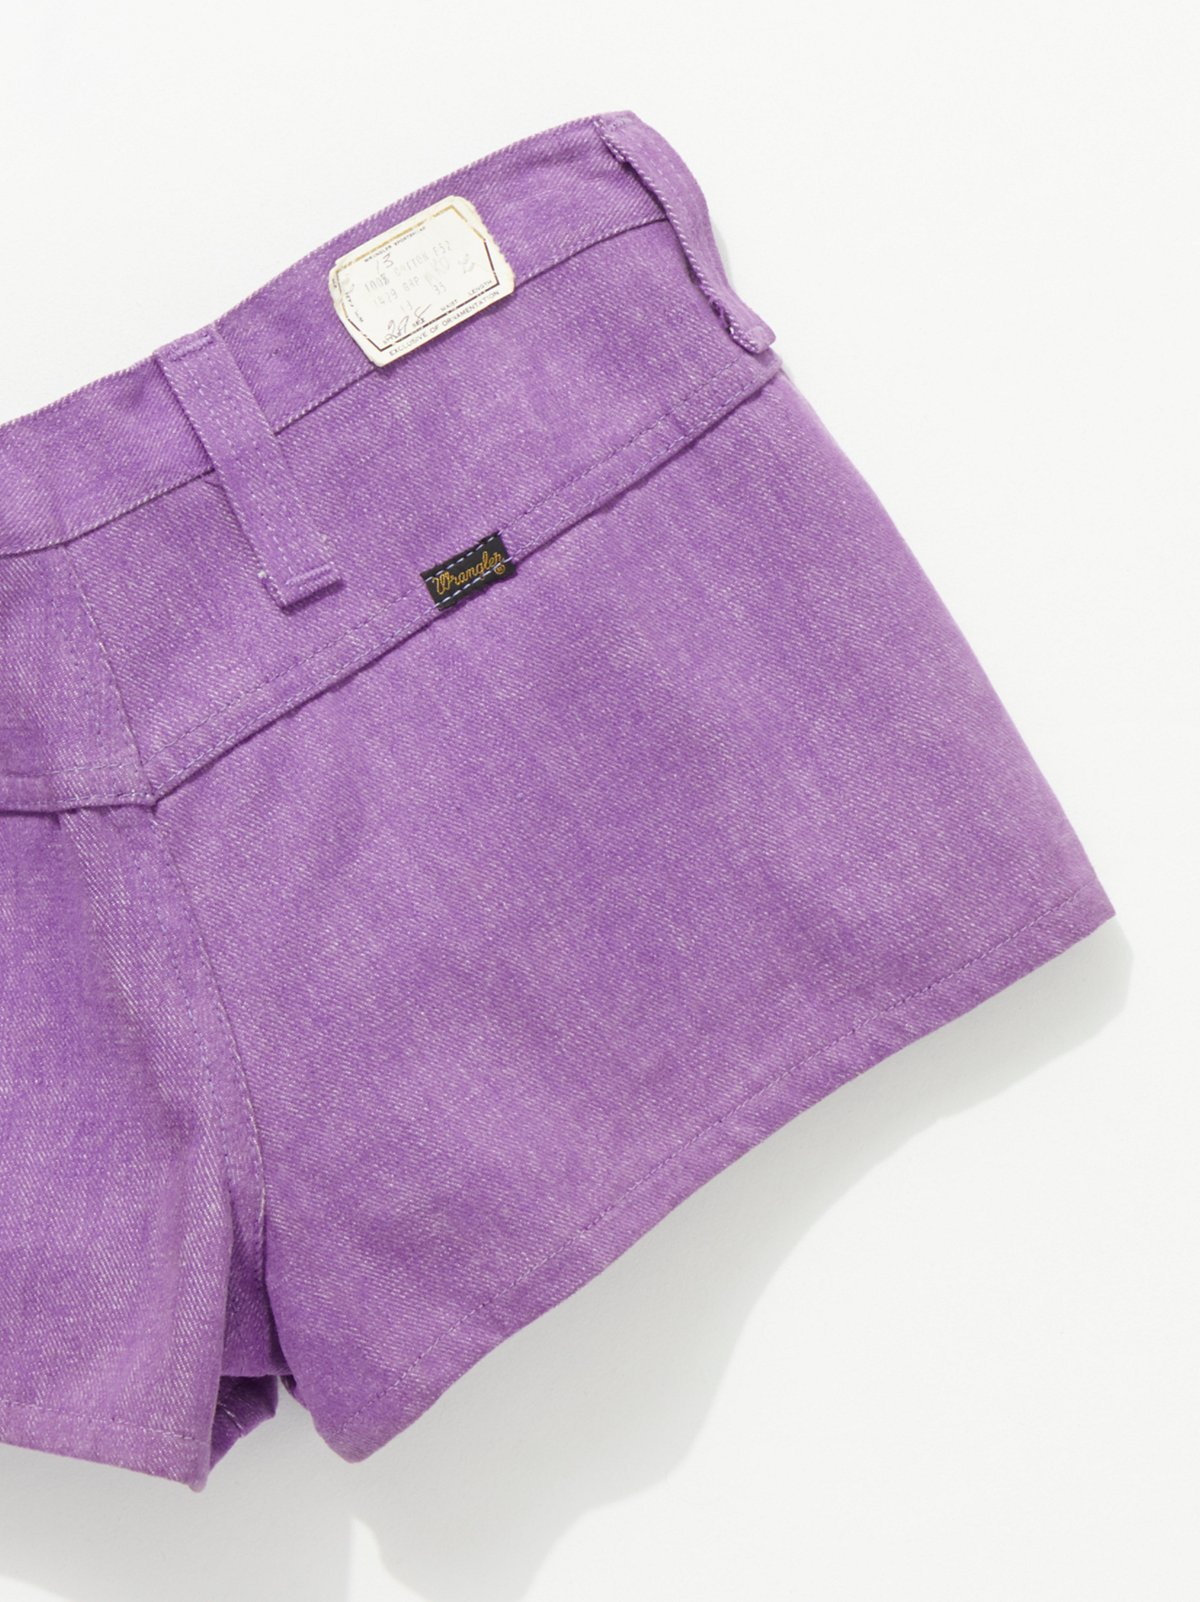 Vintage 1960s Purple Denim Hot Shorts